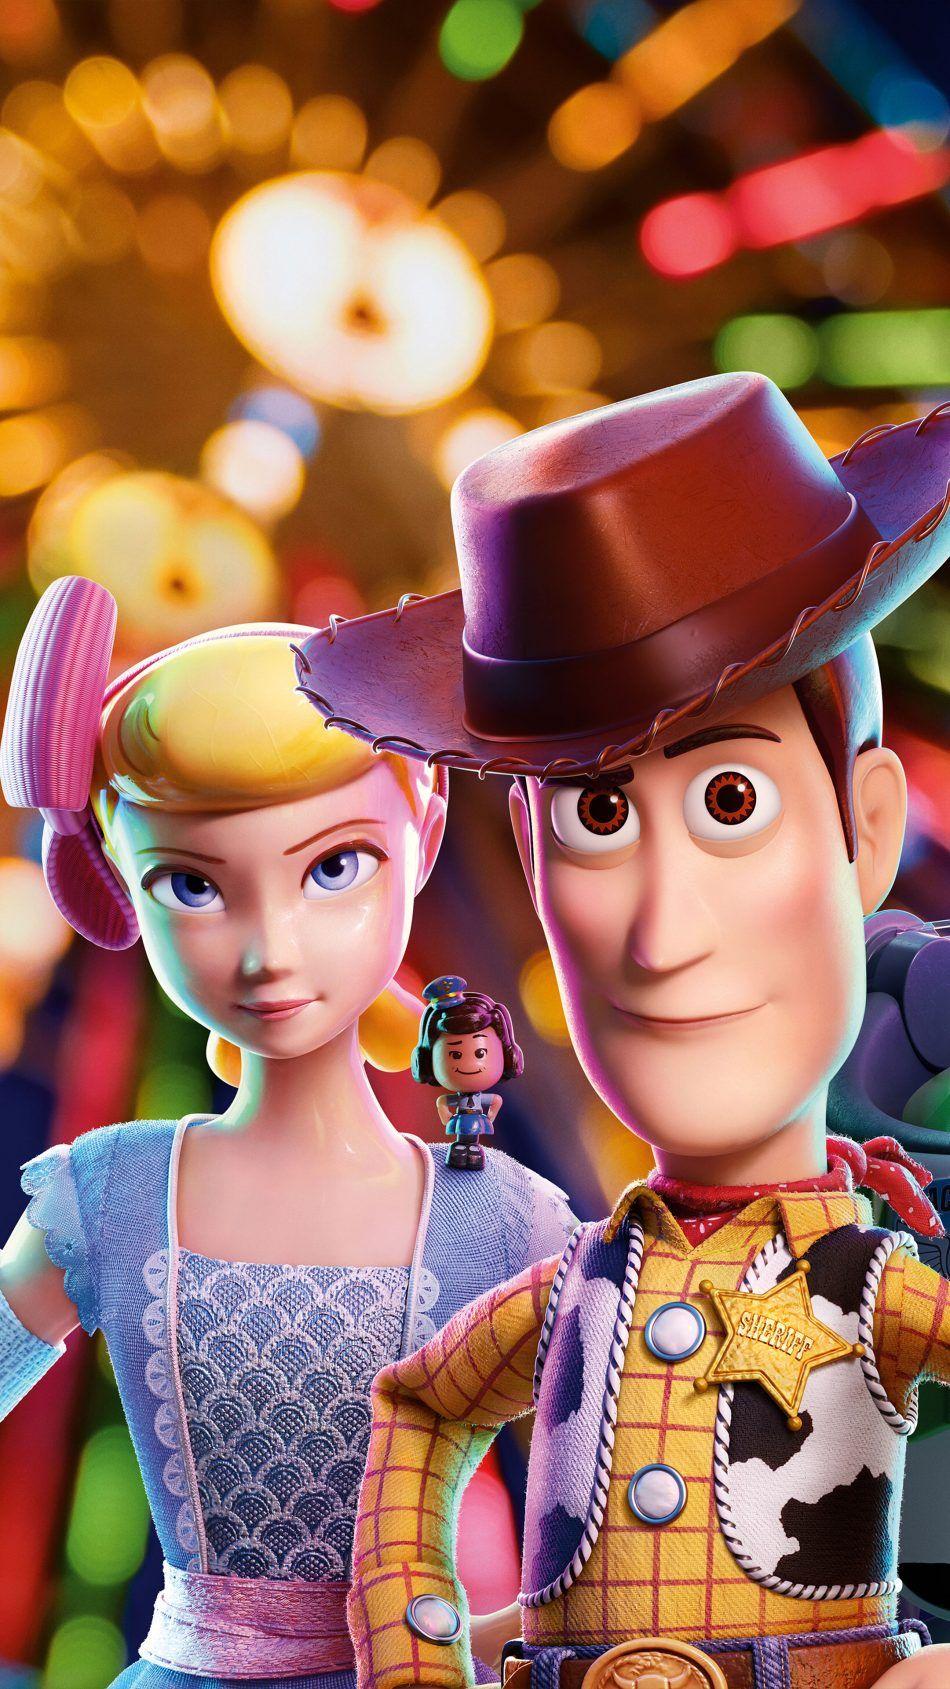 Bo Peep Woody In Toy Story 4 Animation 4k Ultra Hd Mobile Wallpaper Bo Peep Toy Story Disney Characters Wallpaper Woody Toy Story